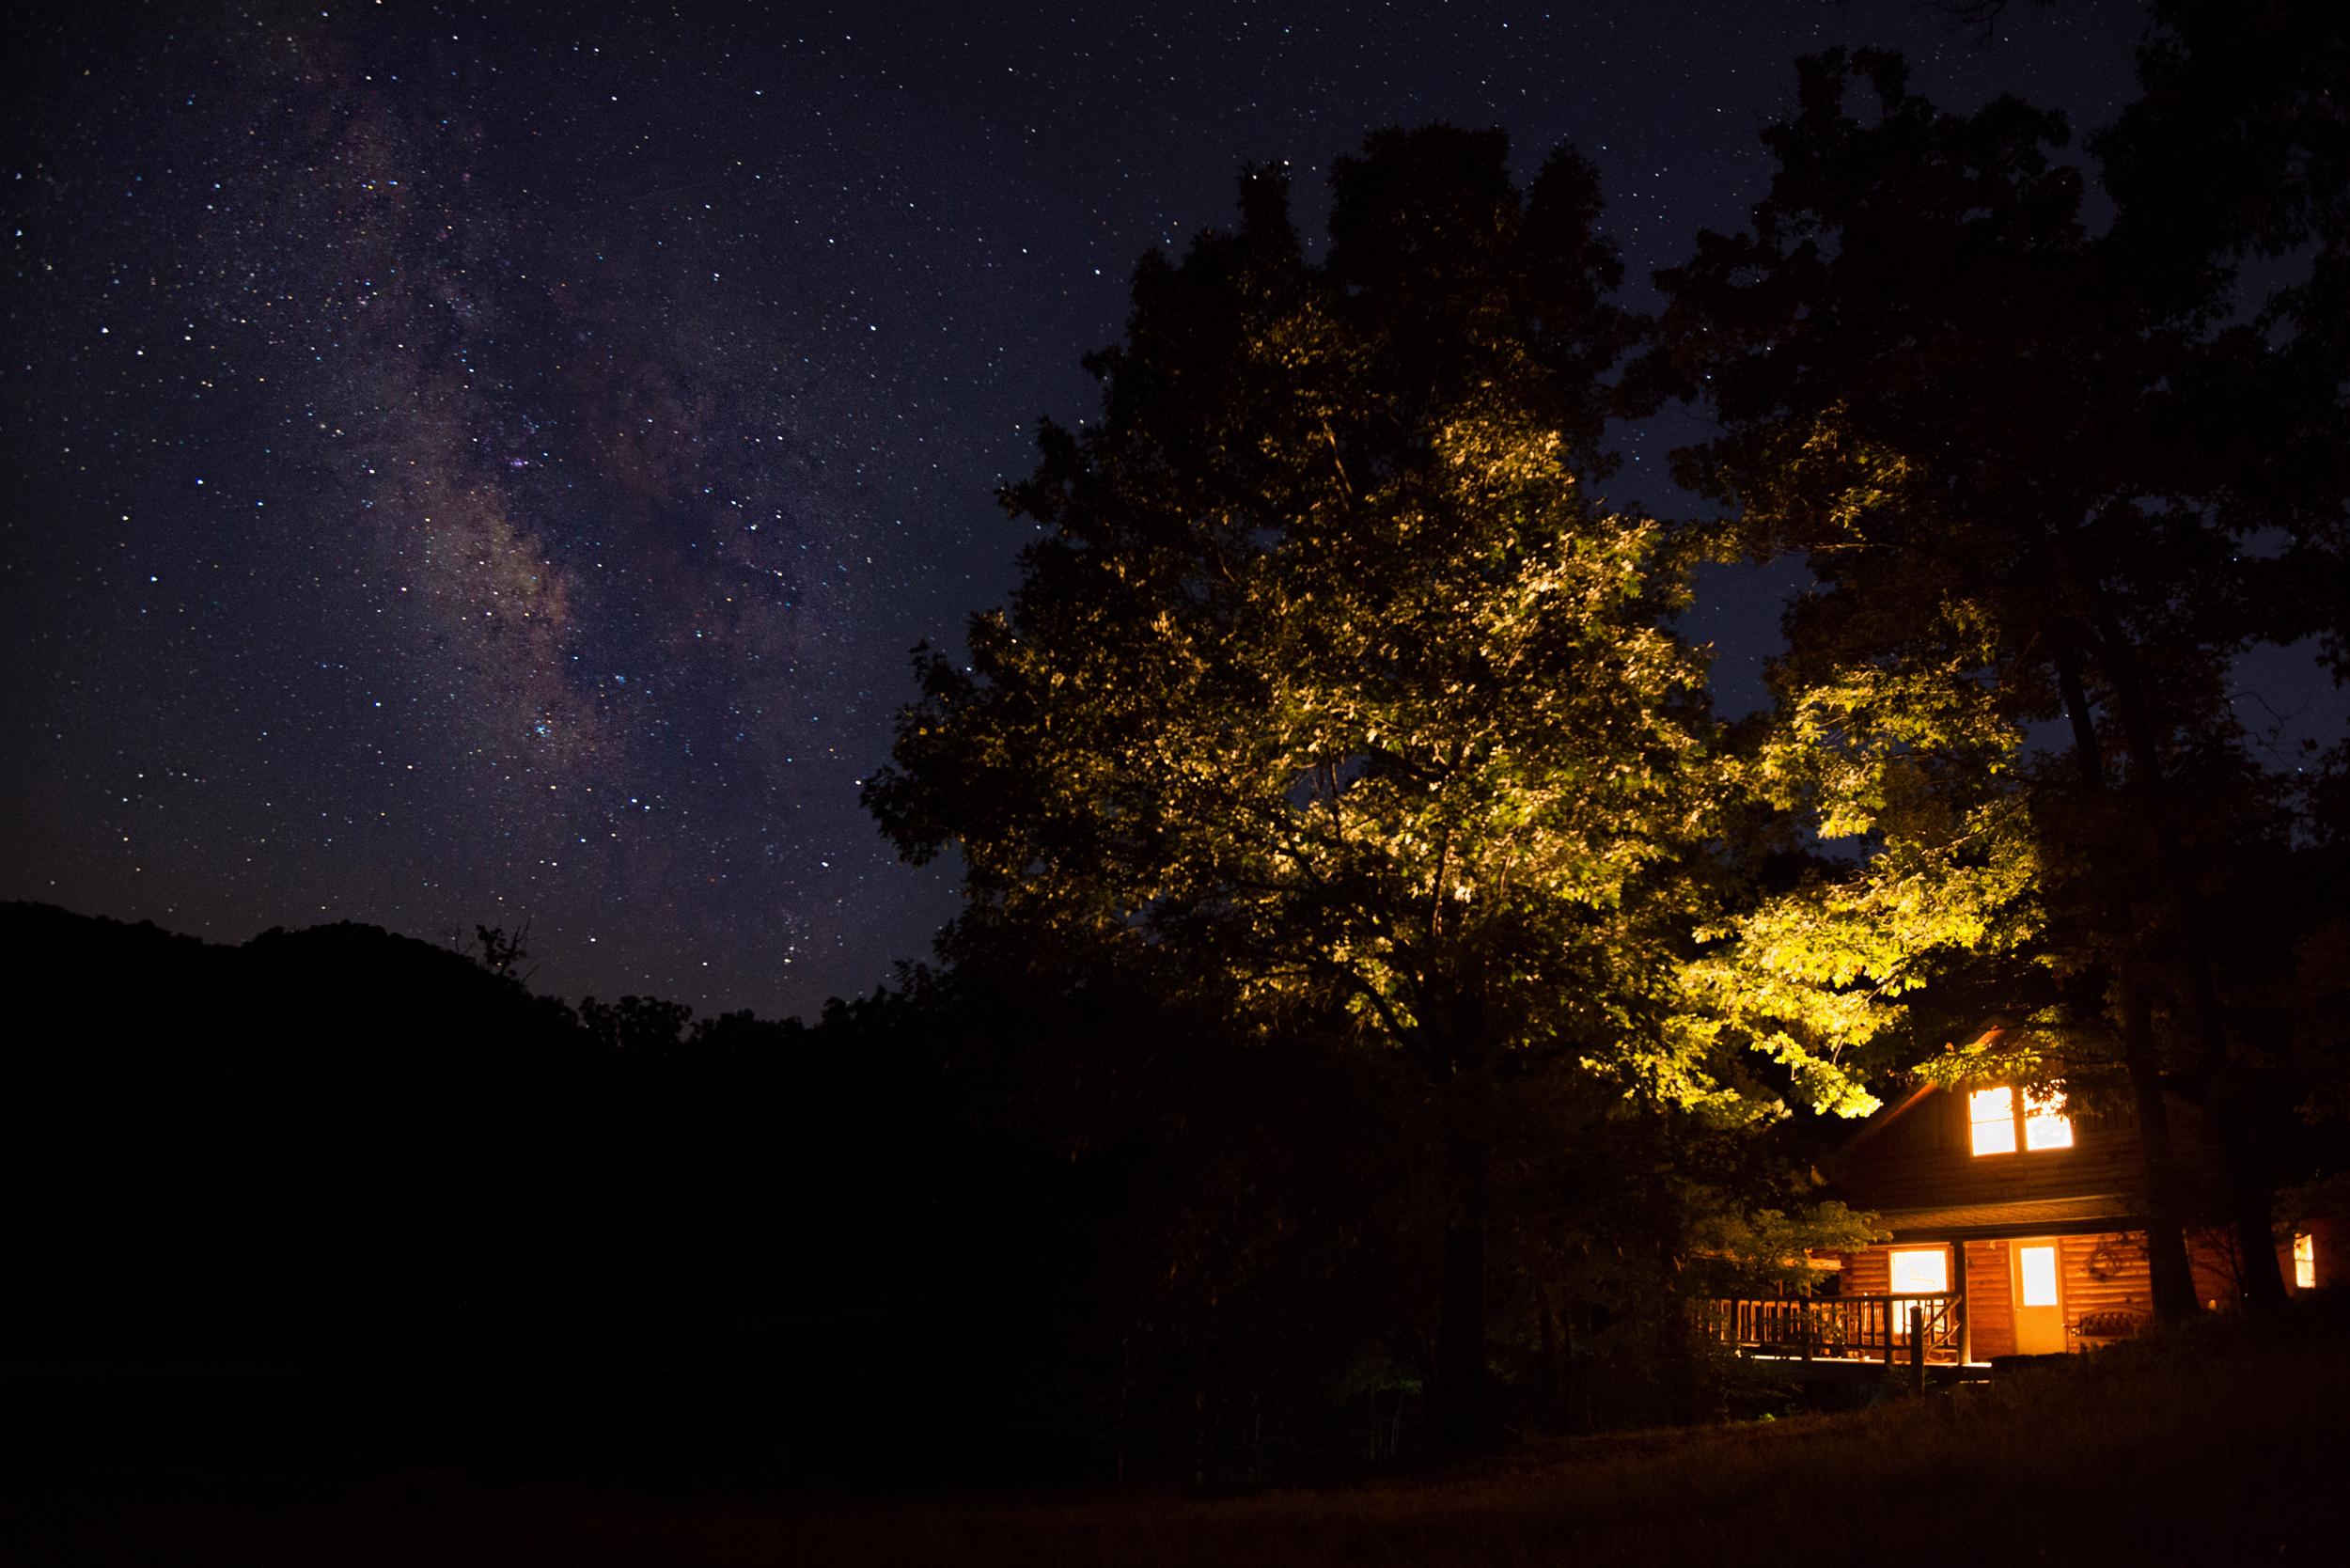 Under the Milky Way